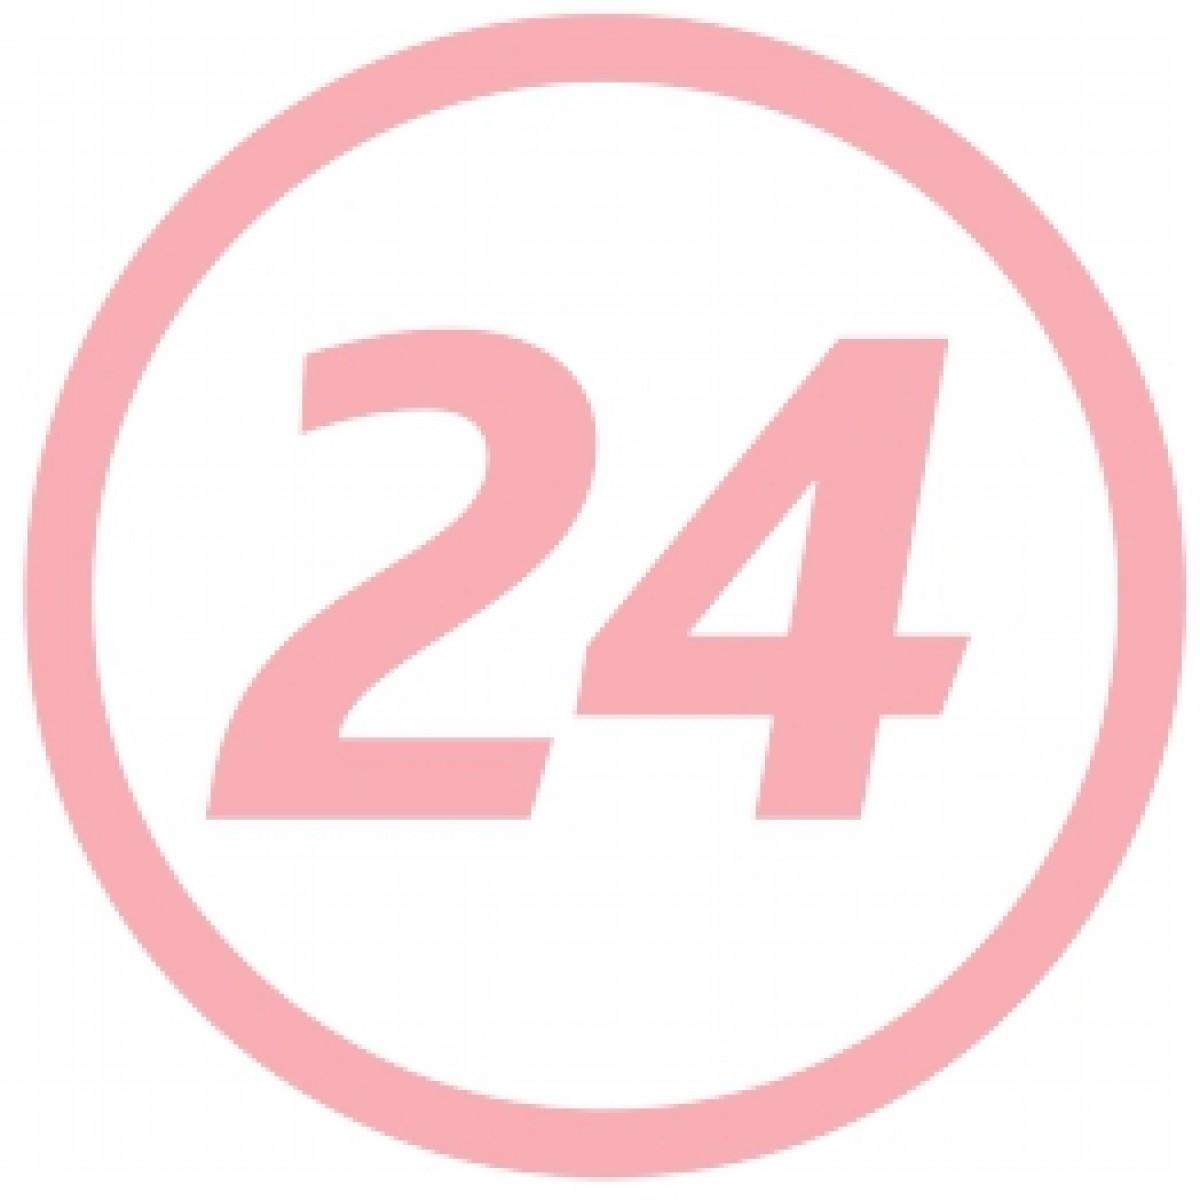 VICHY Liftactiv FlexiTeint 45 Nude, Fond de Ten, 30ml